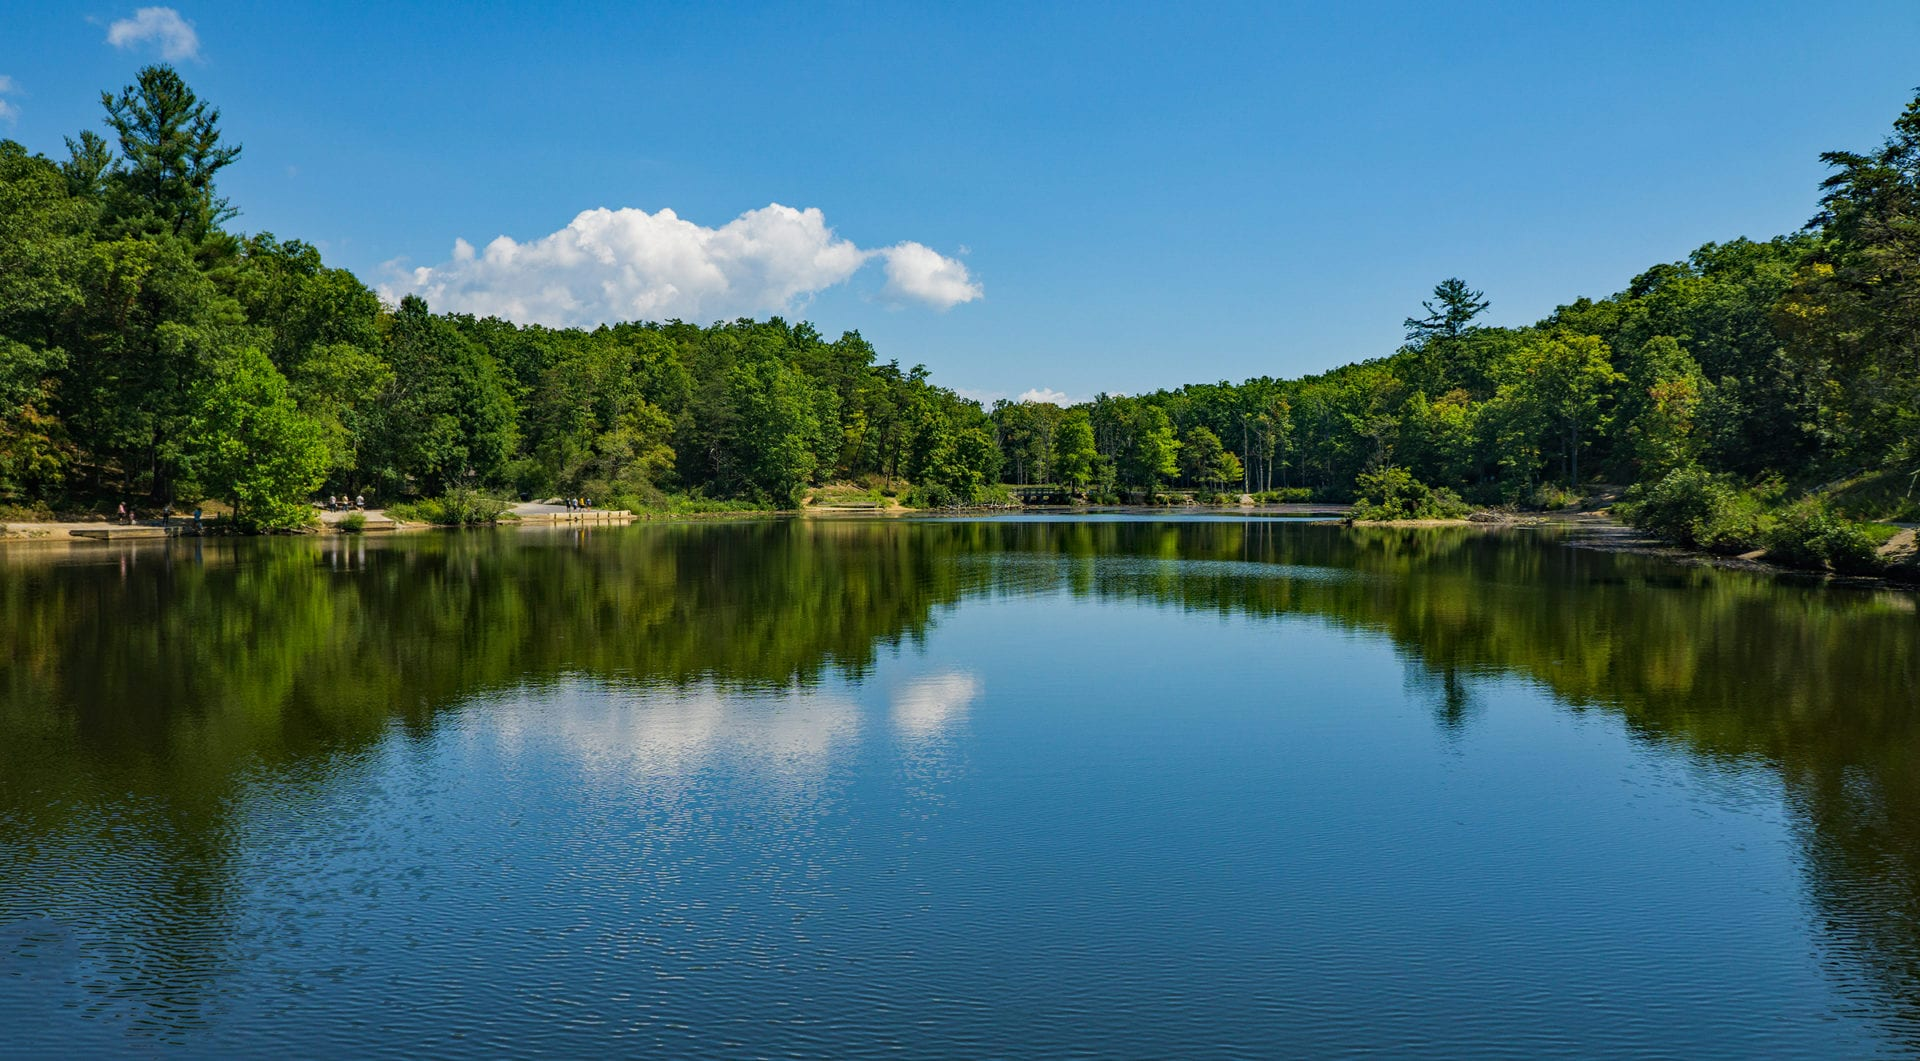 View of Pandapas Pond